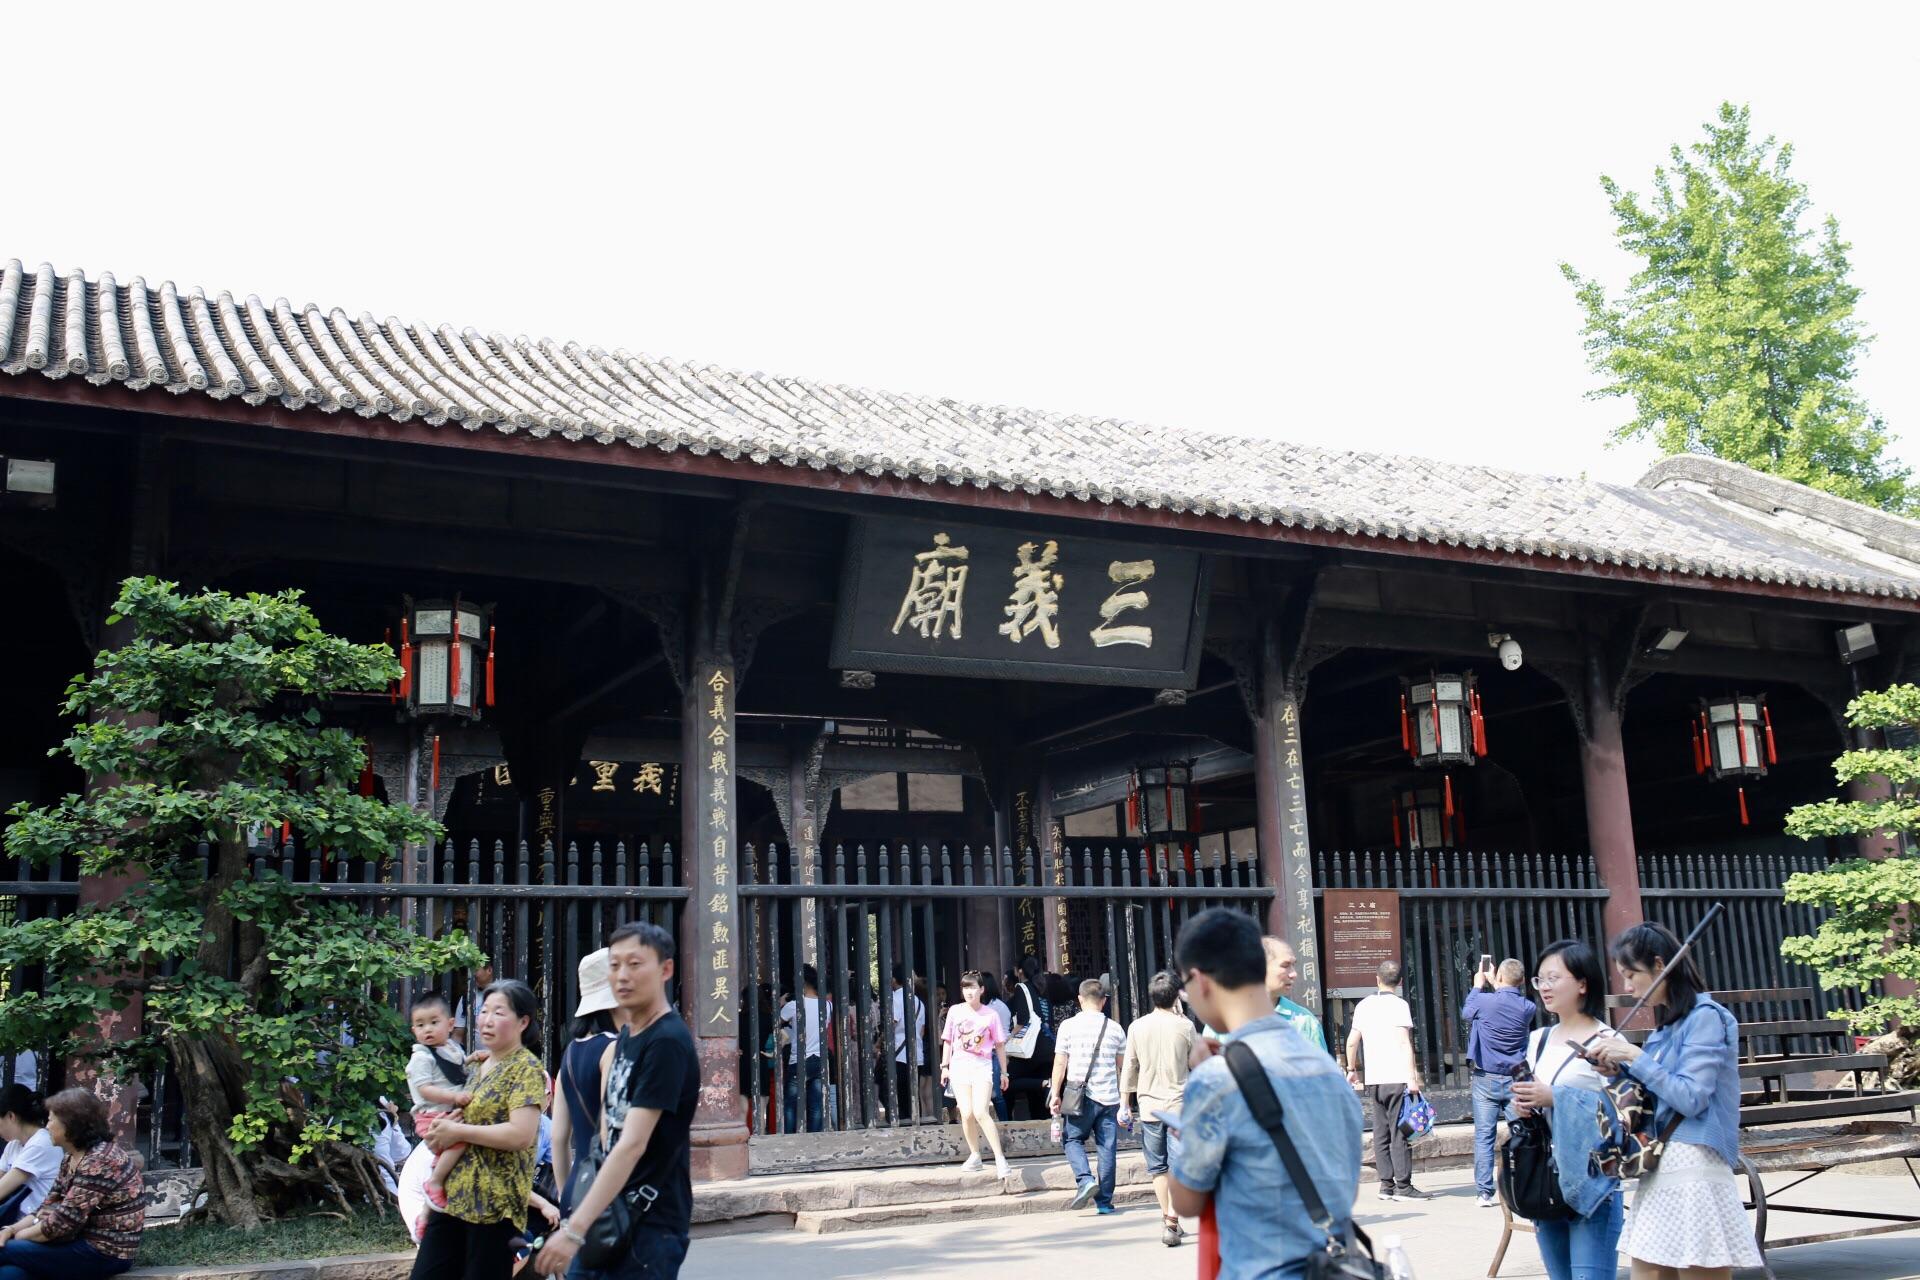 Chengdu Wuhou Temple